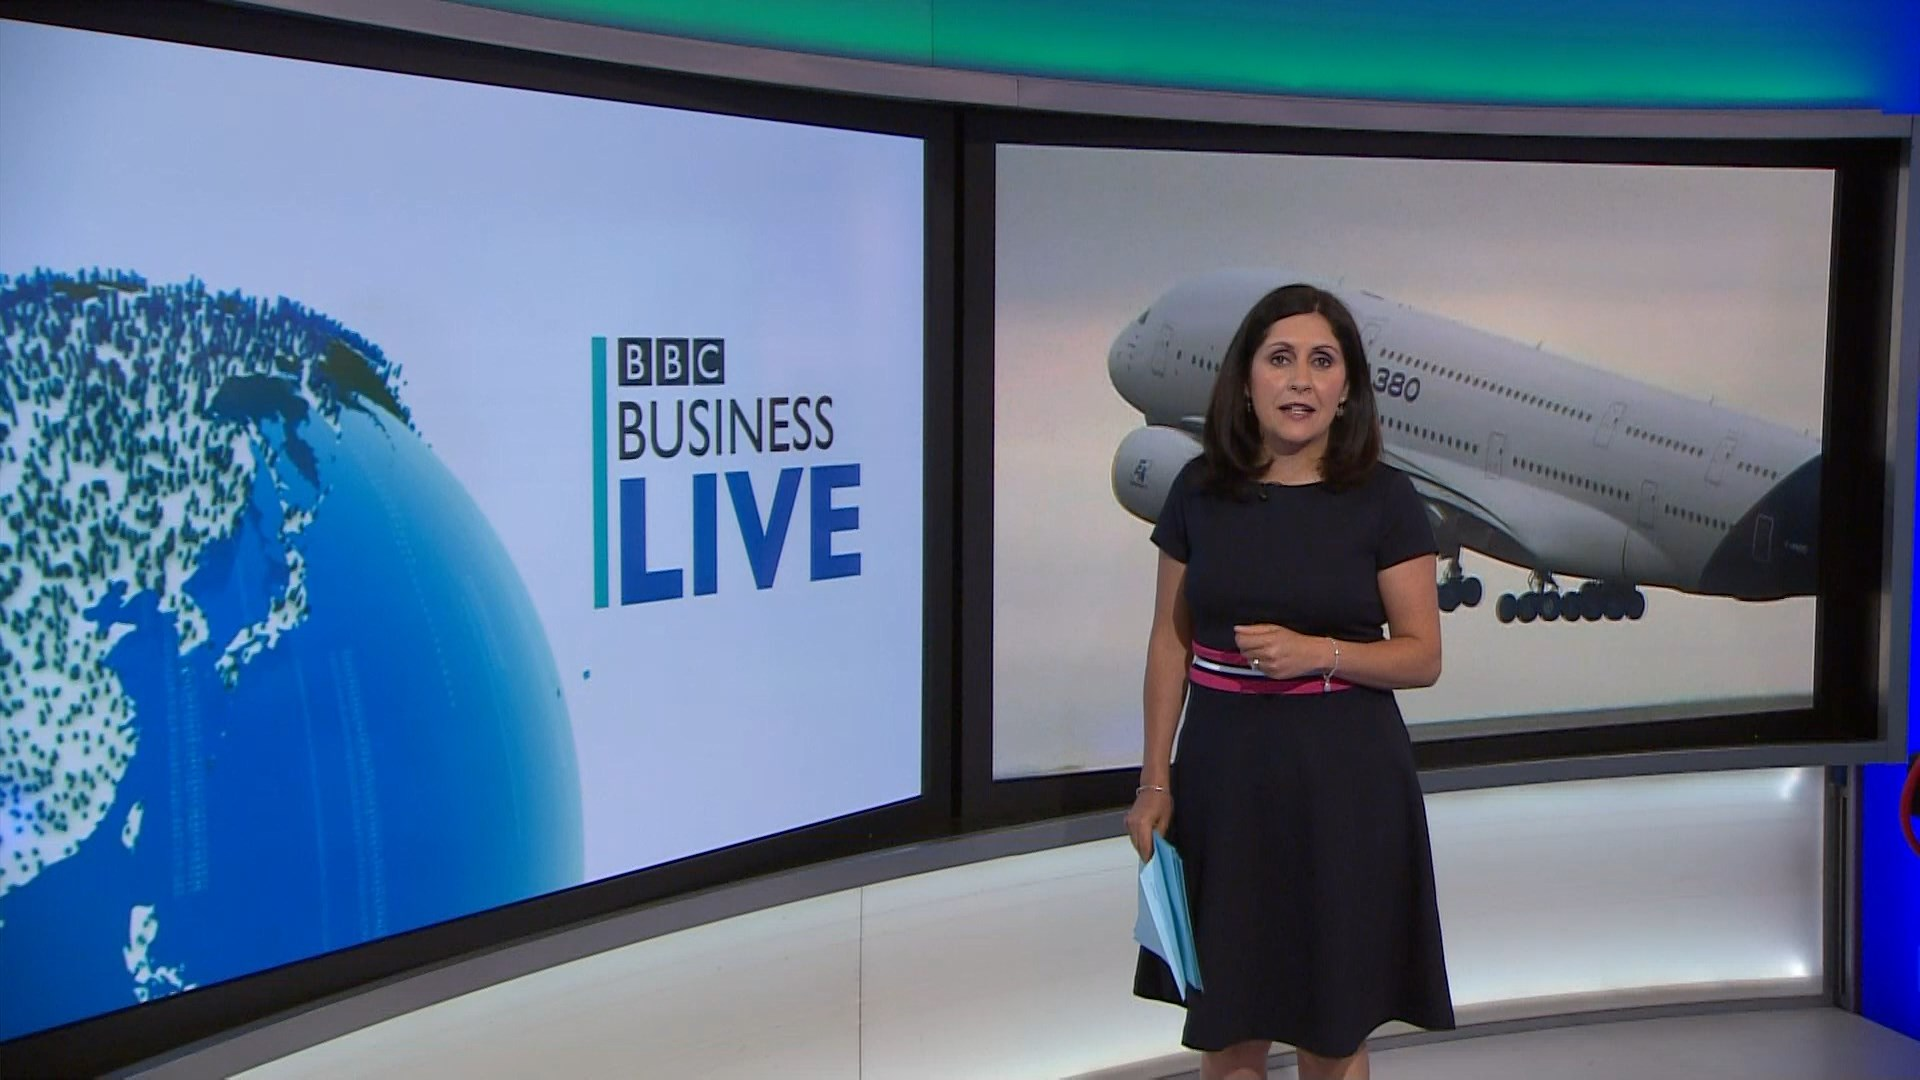 73617377_bbc-business-live_20180622_08300900-ts_snapshot_01-40_-2018-06-22_11-07-04.jpg